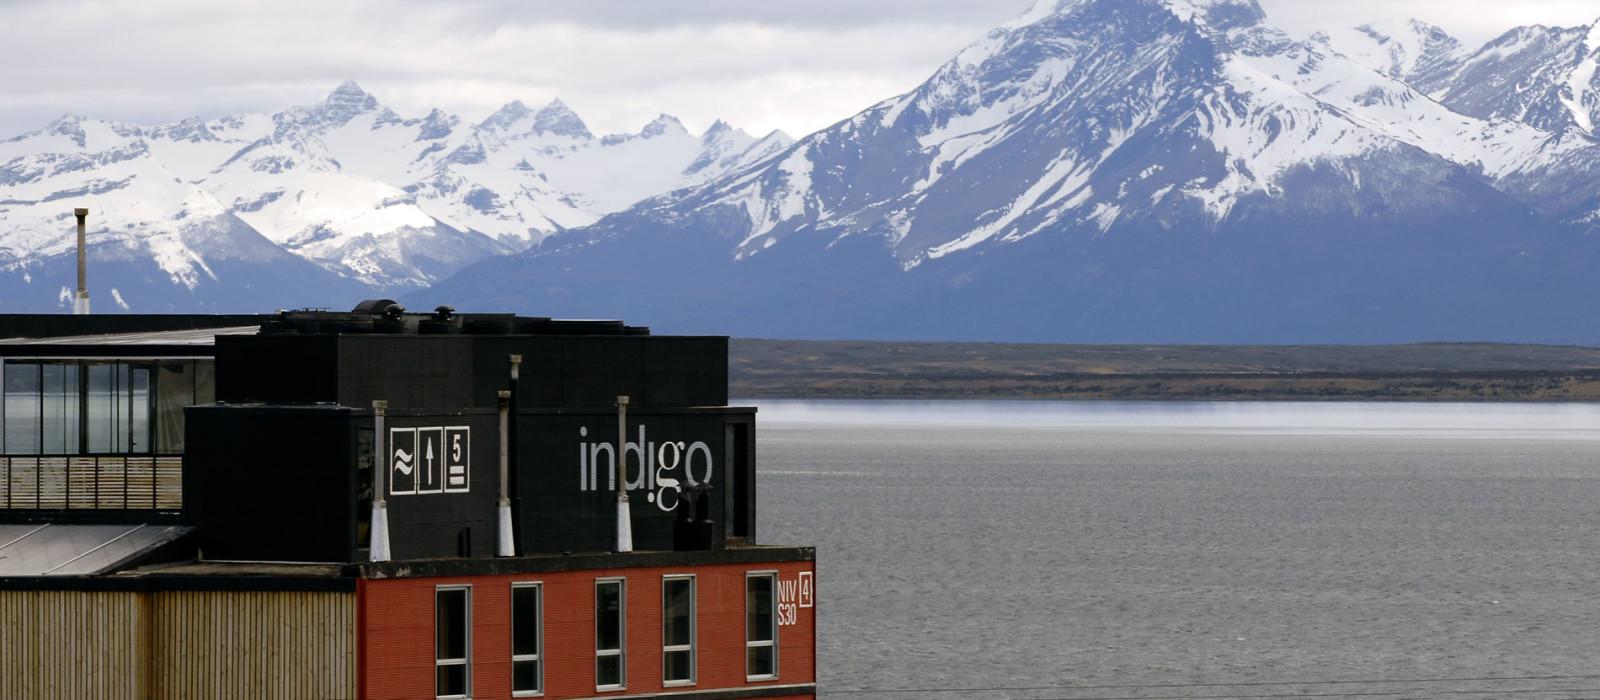 Hotel Noi Indigo Patagonia Chile